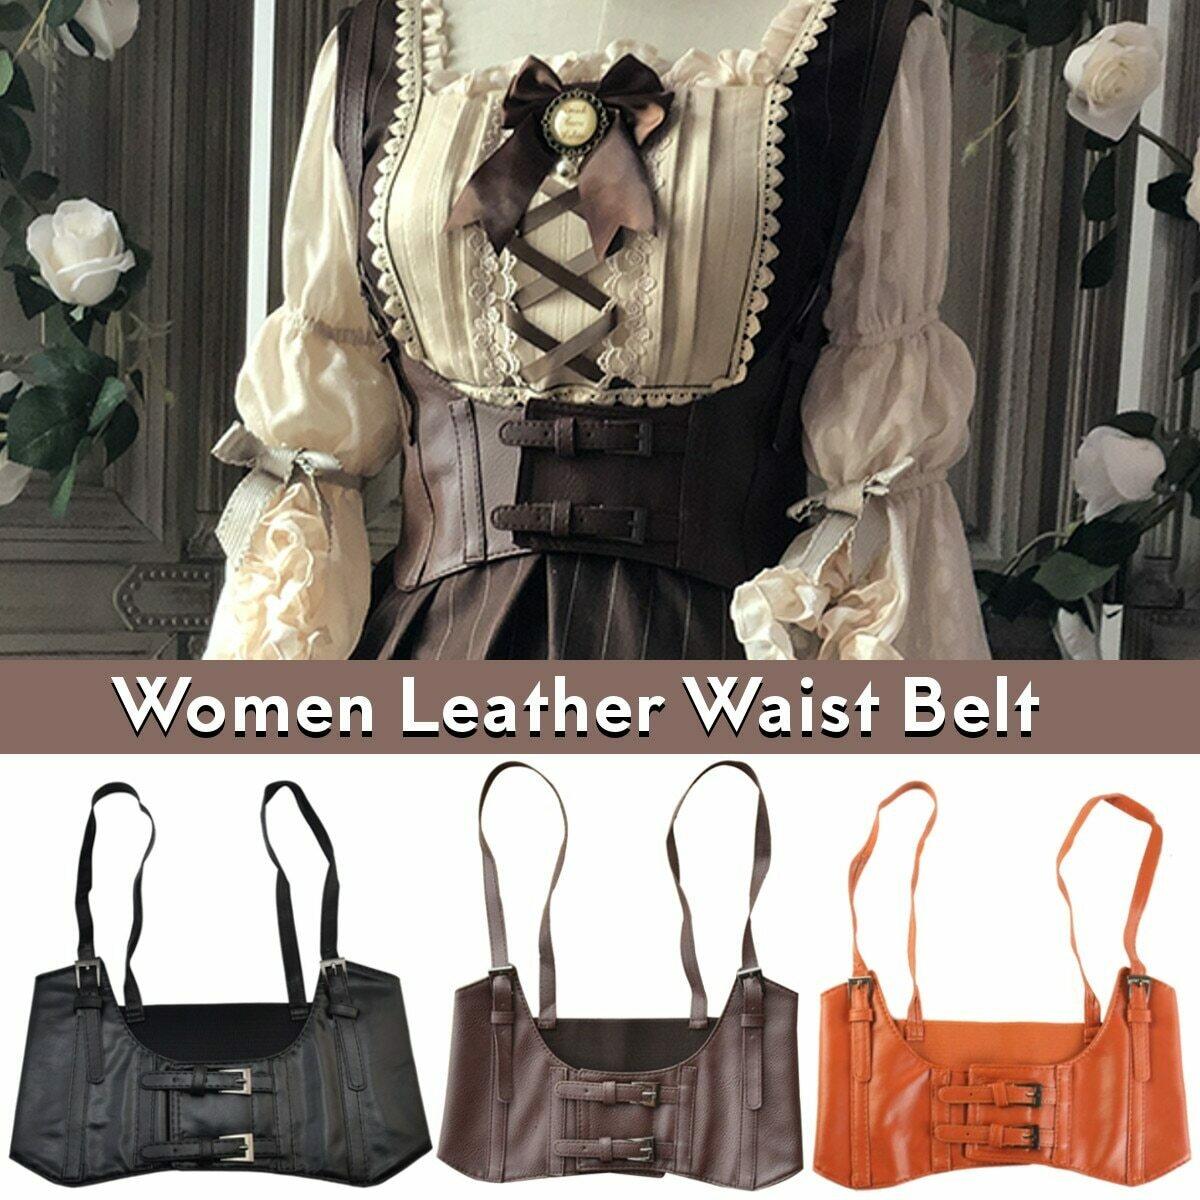 Brand New Arrival Vintage Women's Corset vest Steampunk Harness Stretchy Waistcoat Wide Cincher with Buckle Cummerbunds 2020